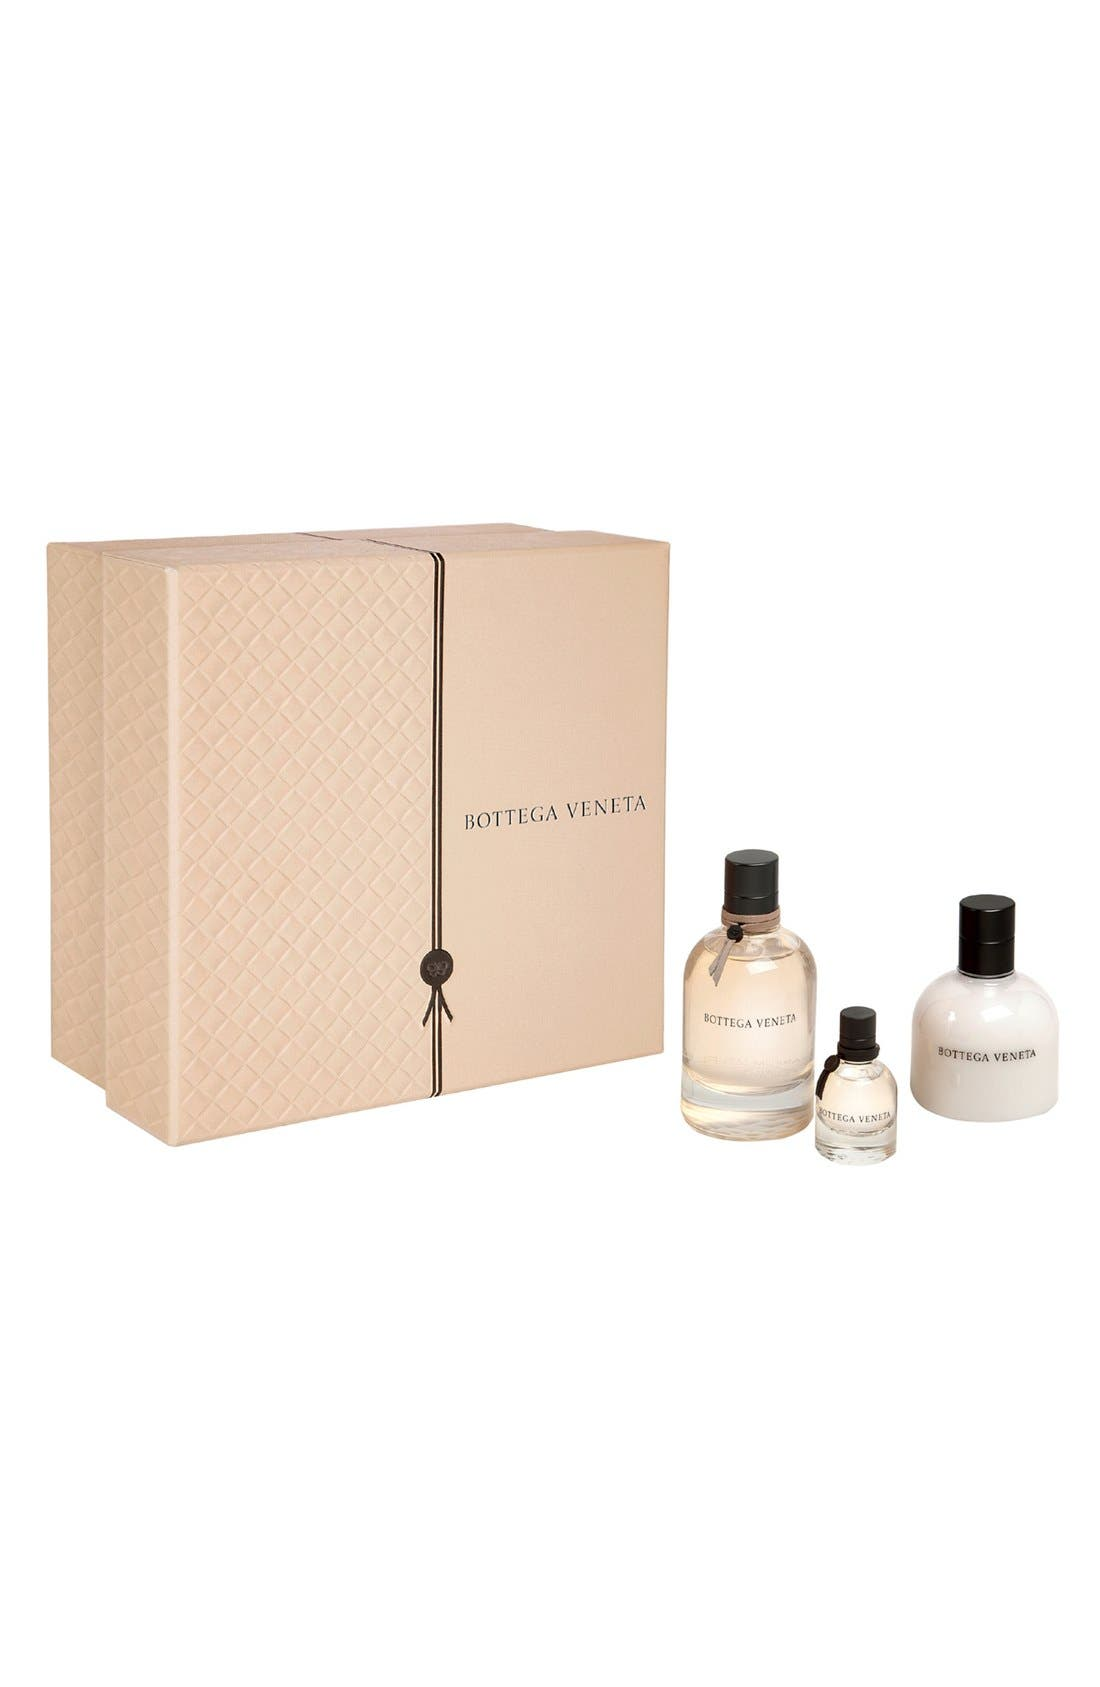 BOTTEGA VENETA Fragrance Gift Set, Main, color, 000